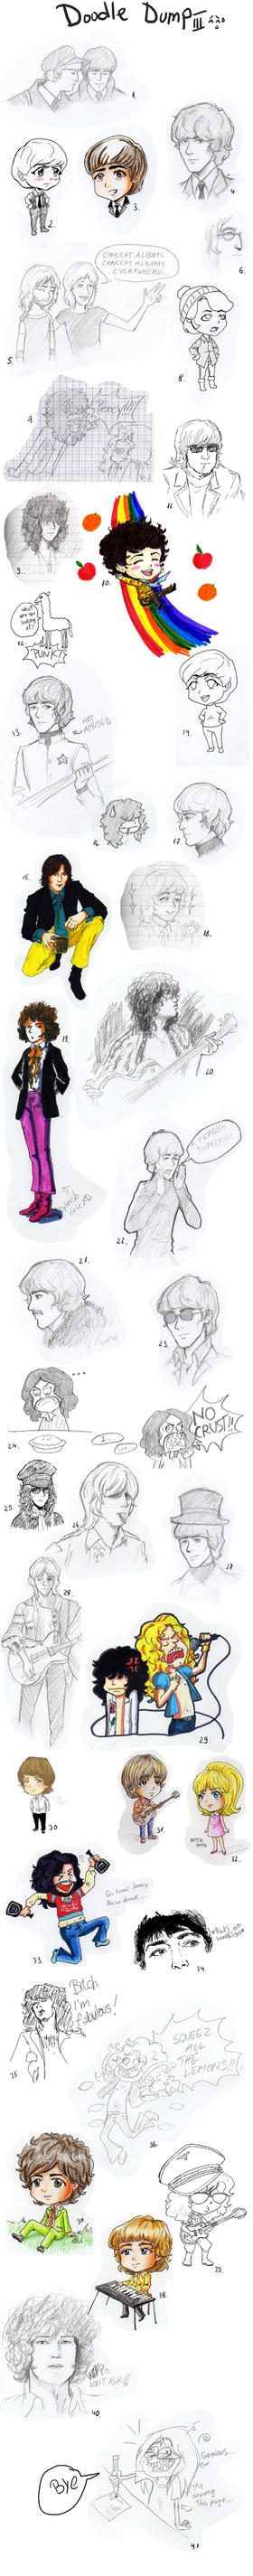 Classic Rock doodle dump by ayumi58